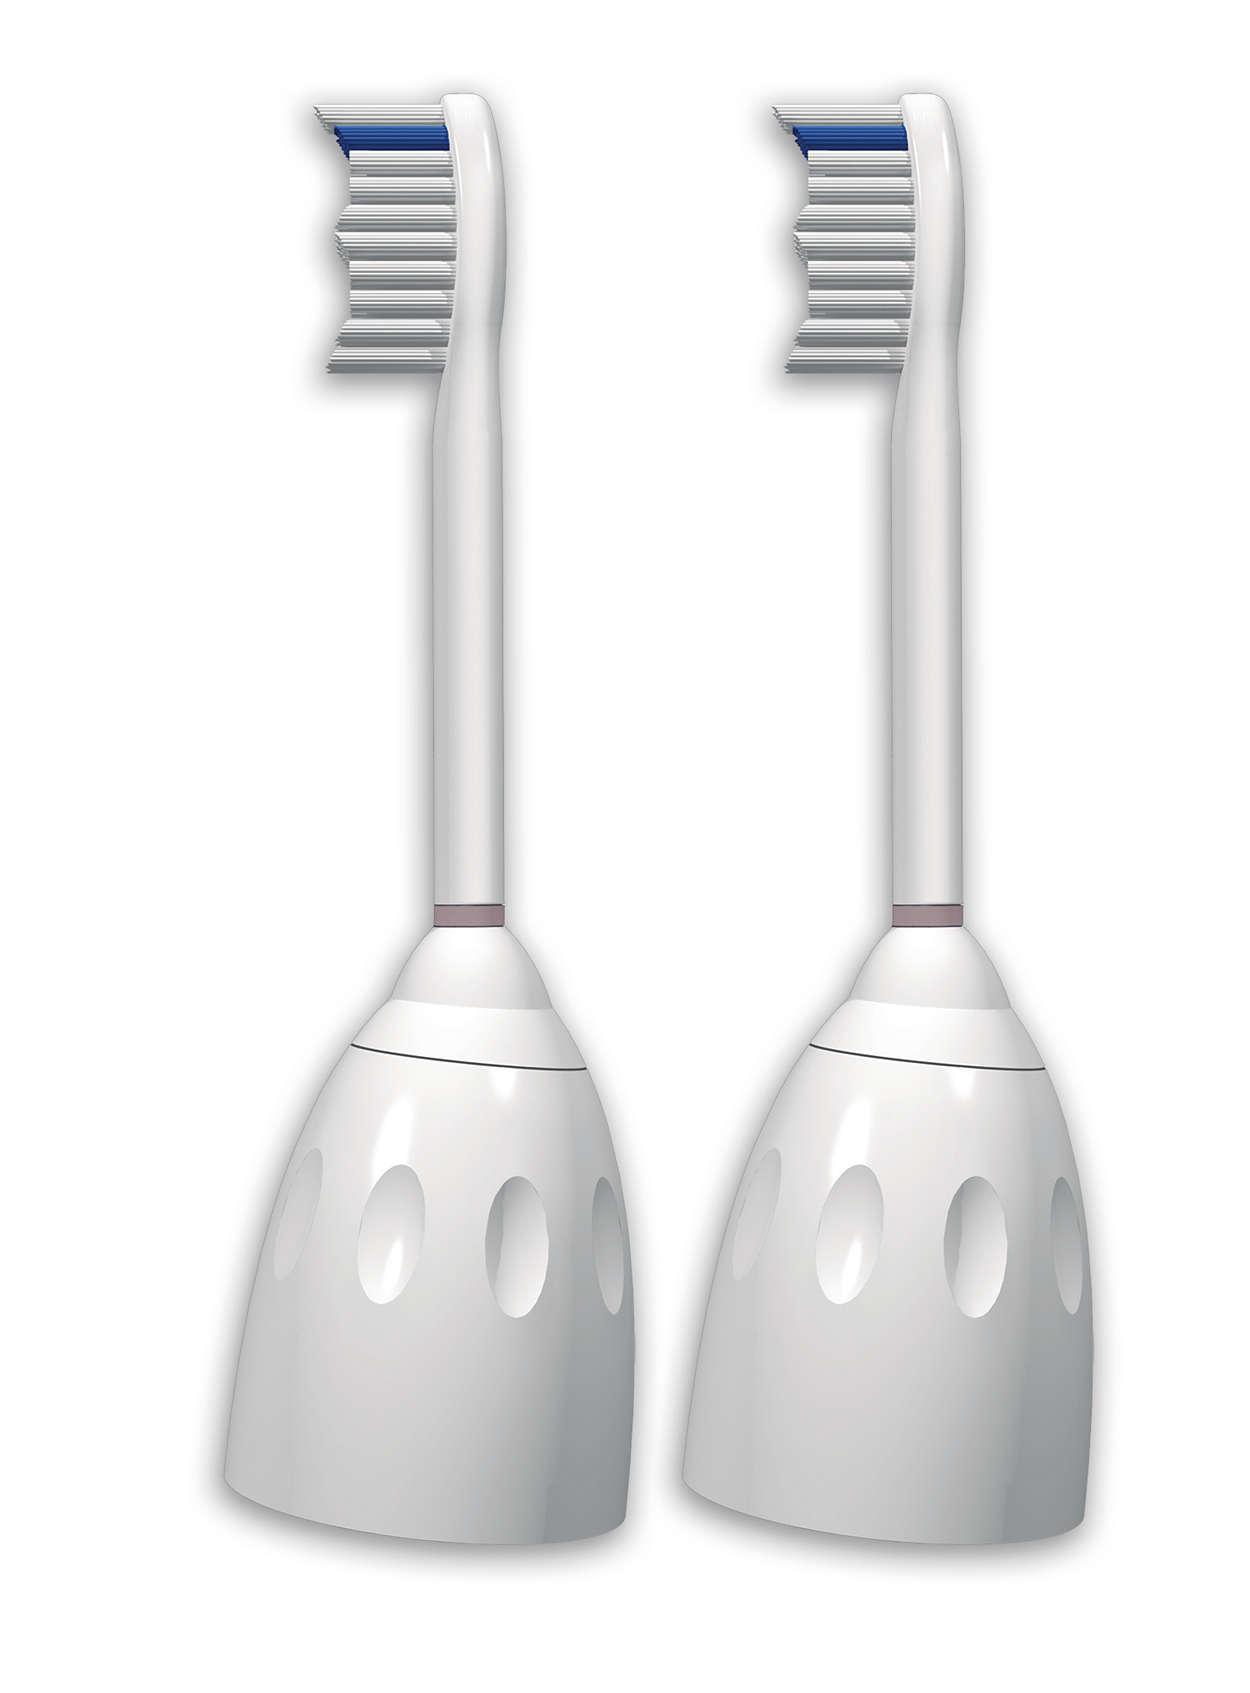 Klassische Leistung bei klassischer Reinigung.